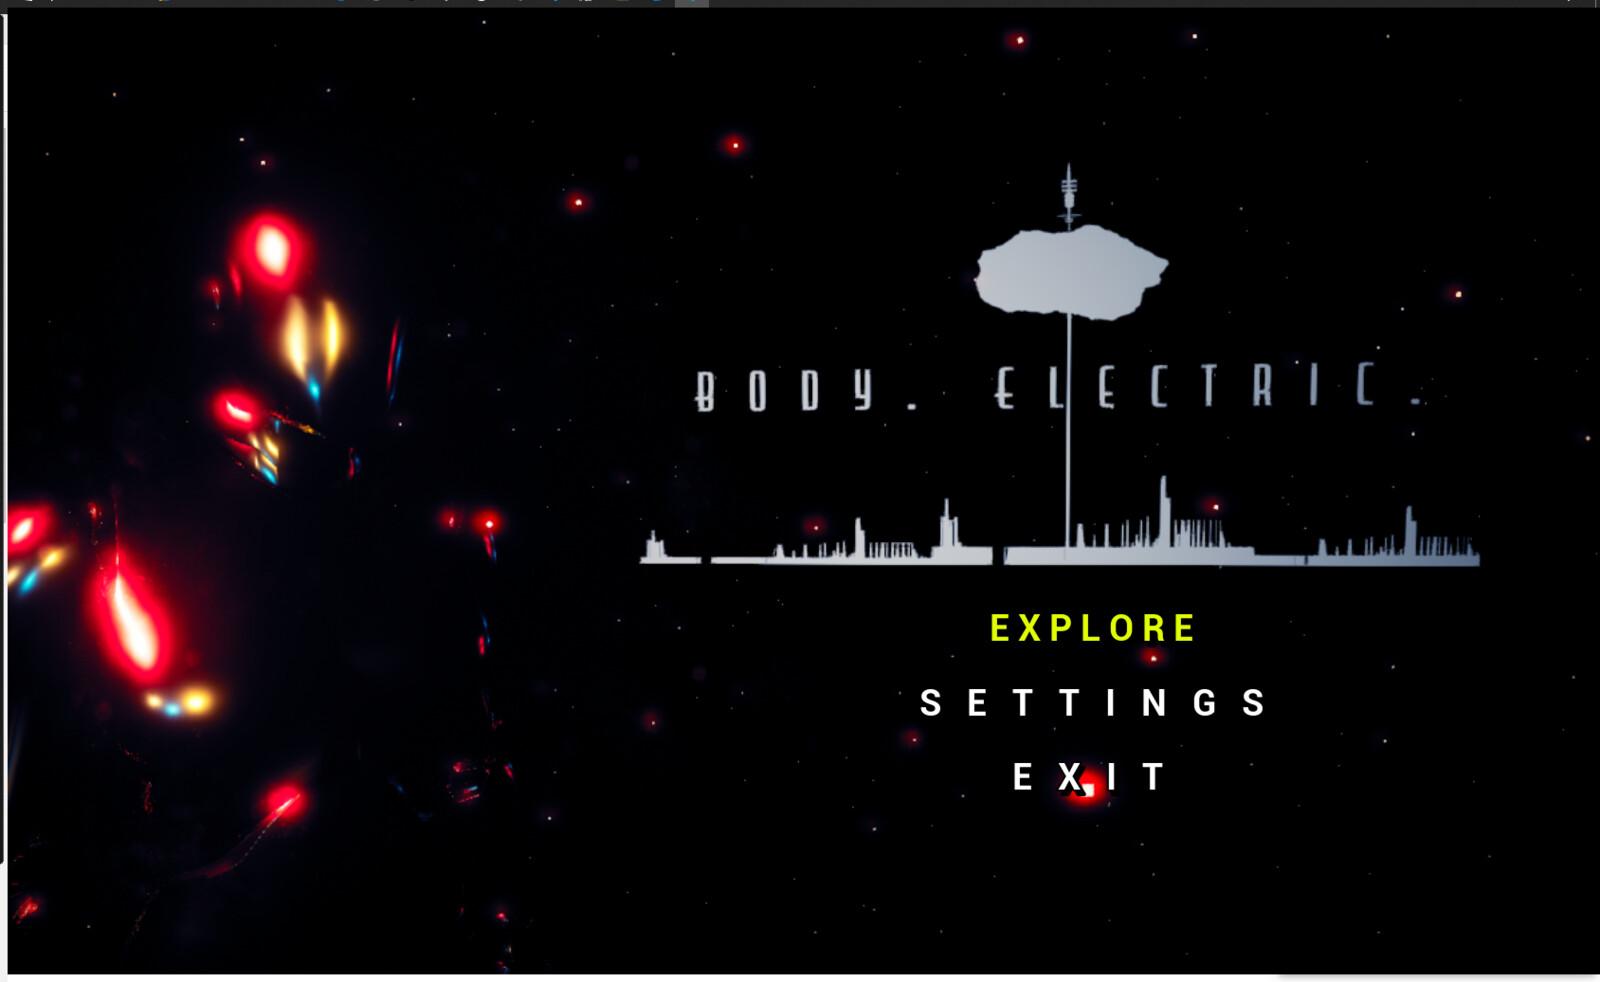 #unrealengine5 #patrickhale #diana121 #rooksproduction #gamedev #bodyelectricmovie